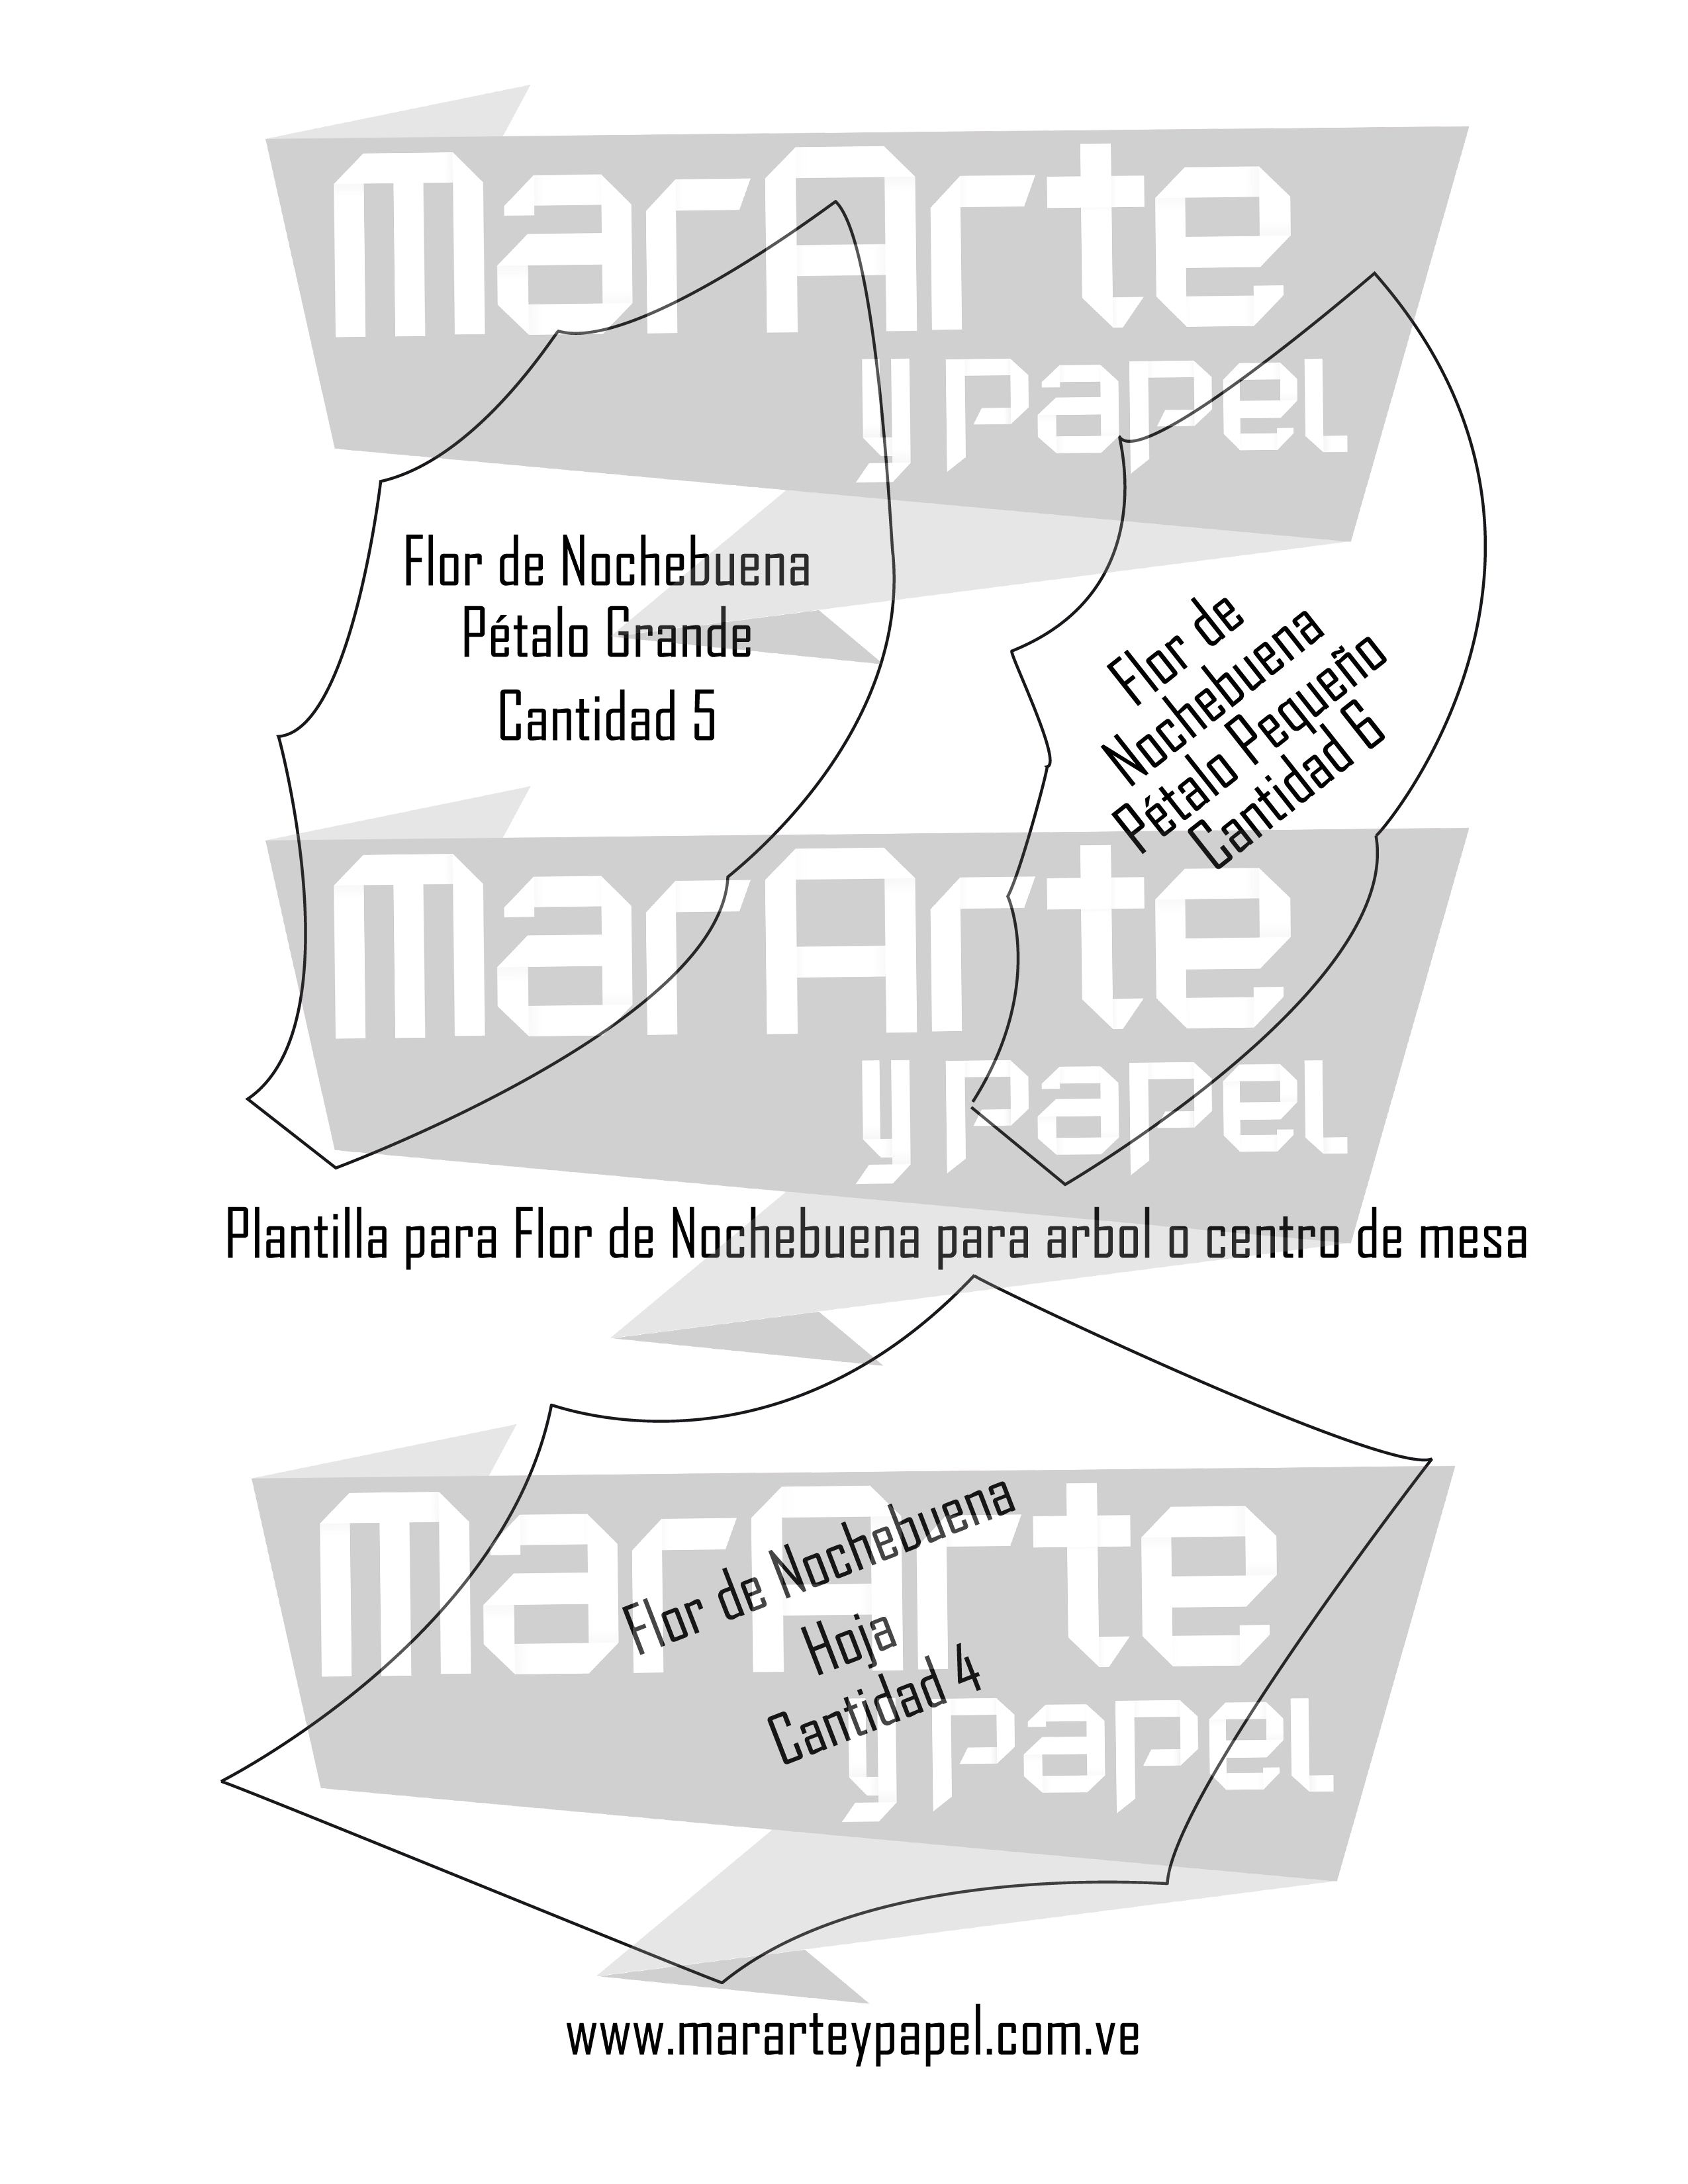 Excepcional Reanudar La Enfermera Quirúrgica Médica Ornamento ...